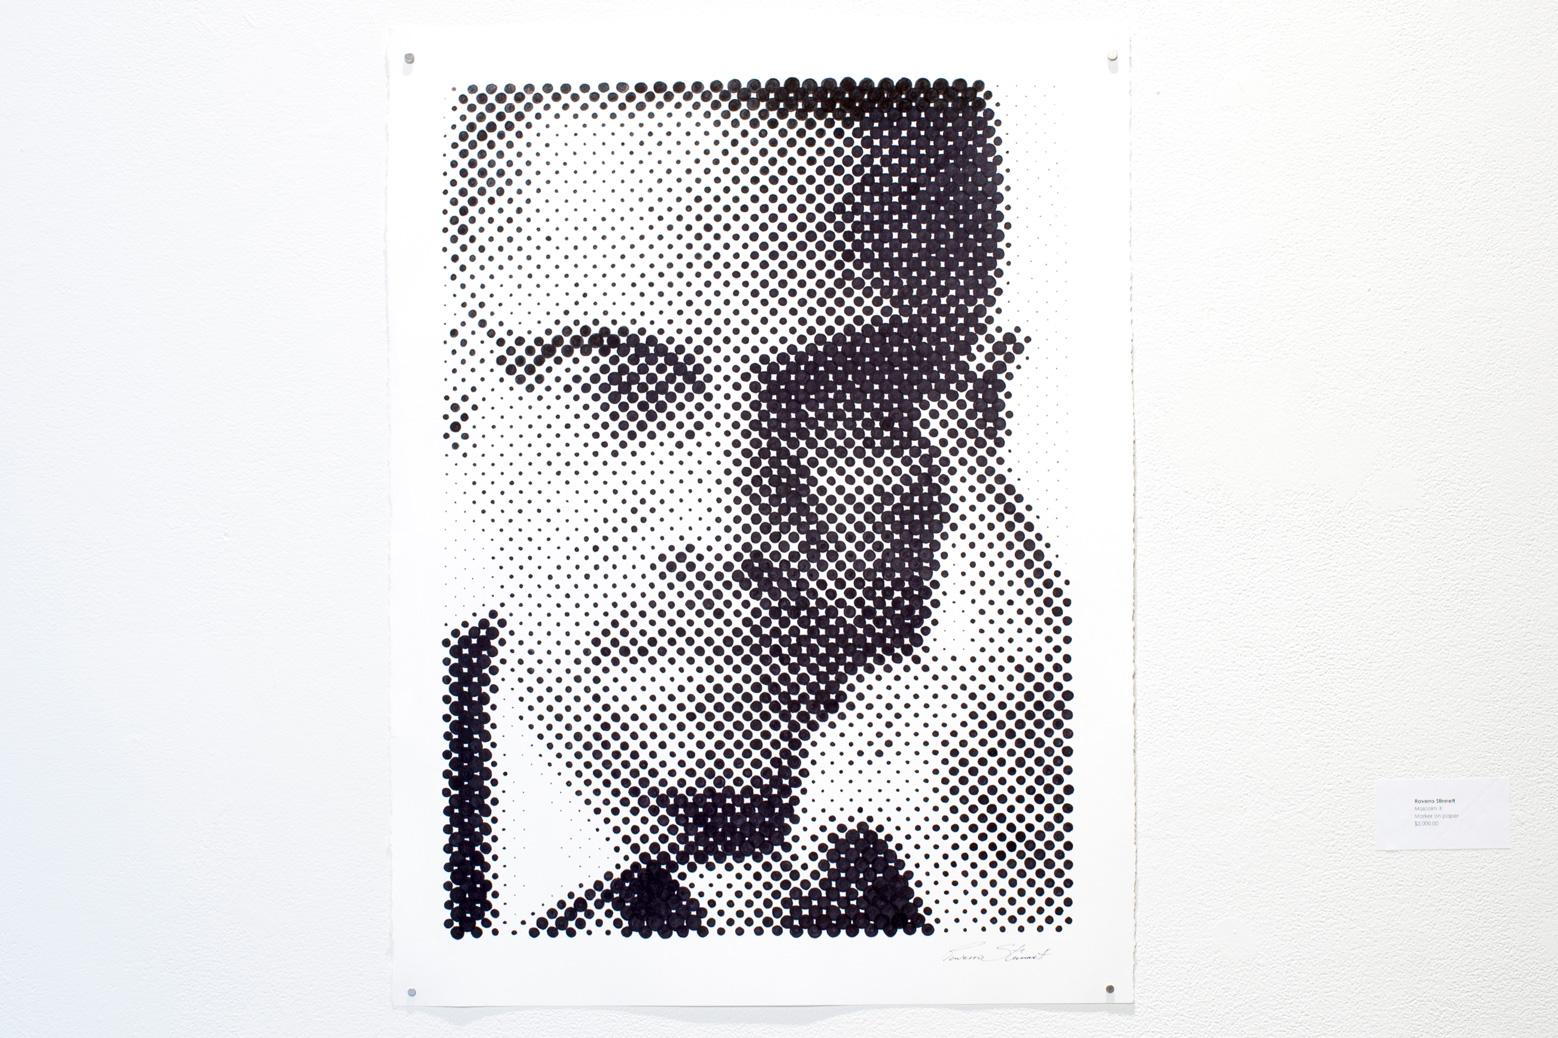 Figure 4: Raverro Stinnett,  Malcom X , 2018.